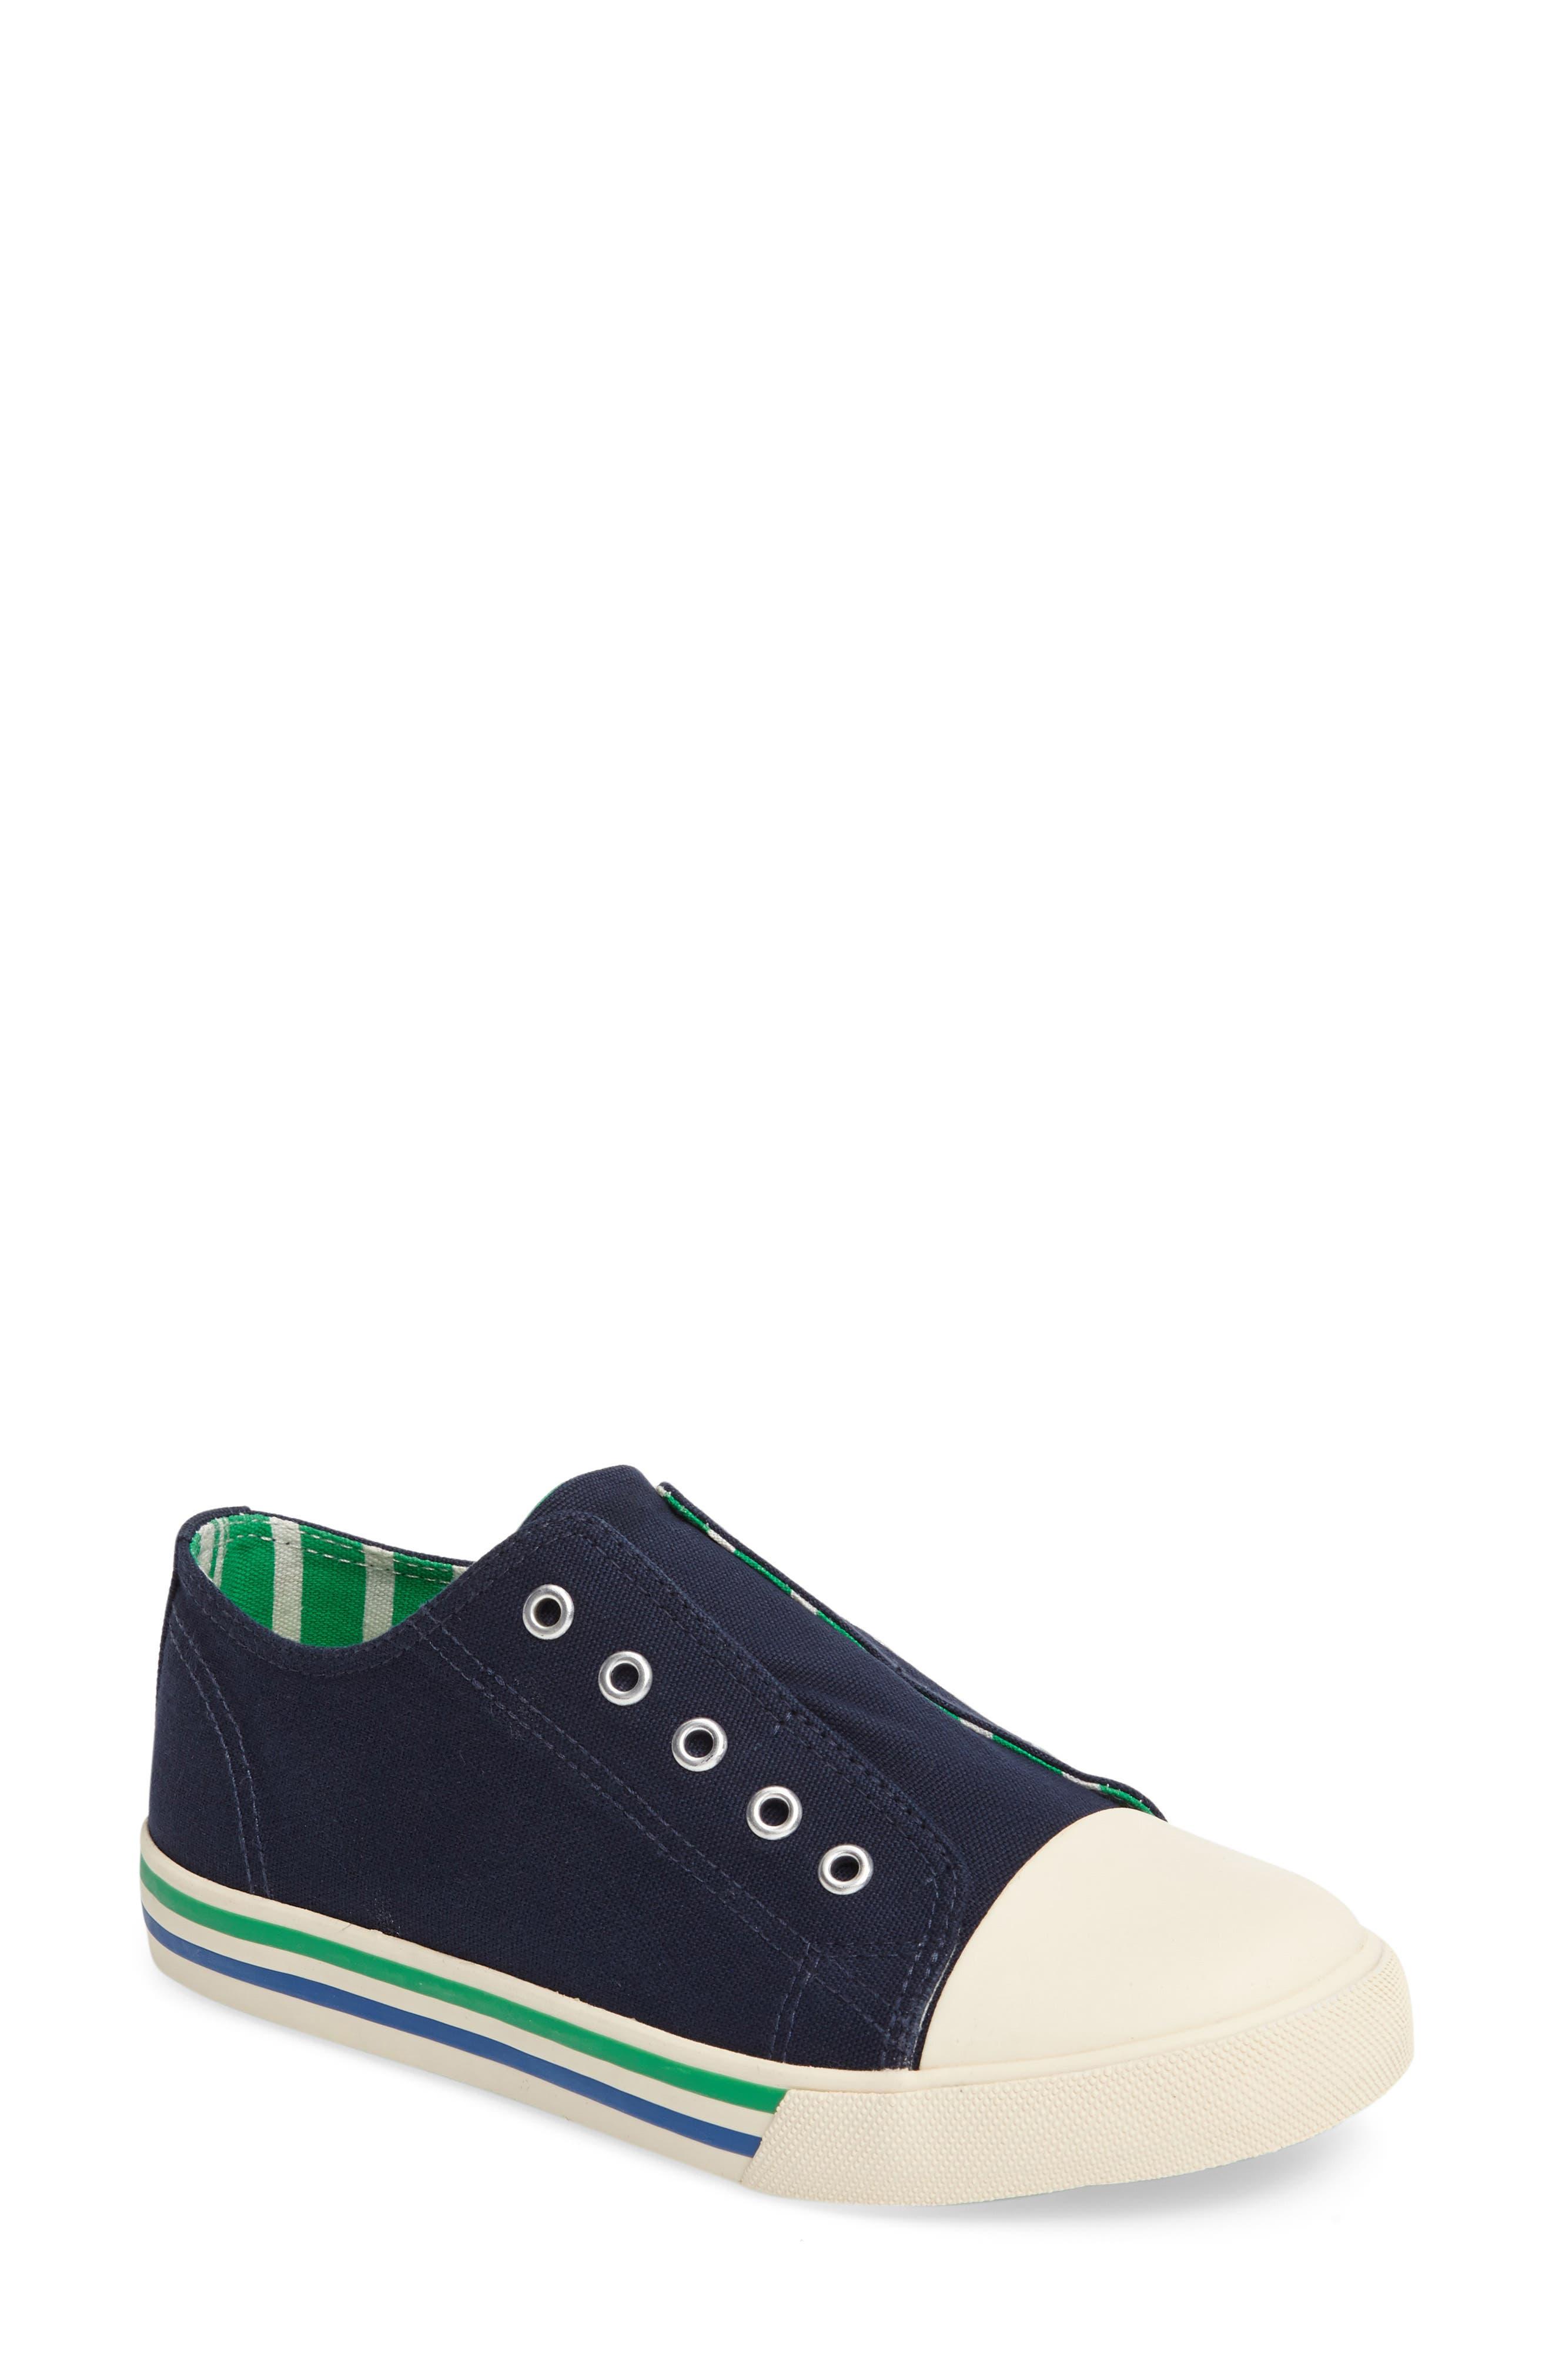 Mini Boden Laceless Sneaker (Toddler, Little Kid & Big Kid)